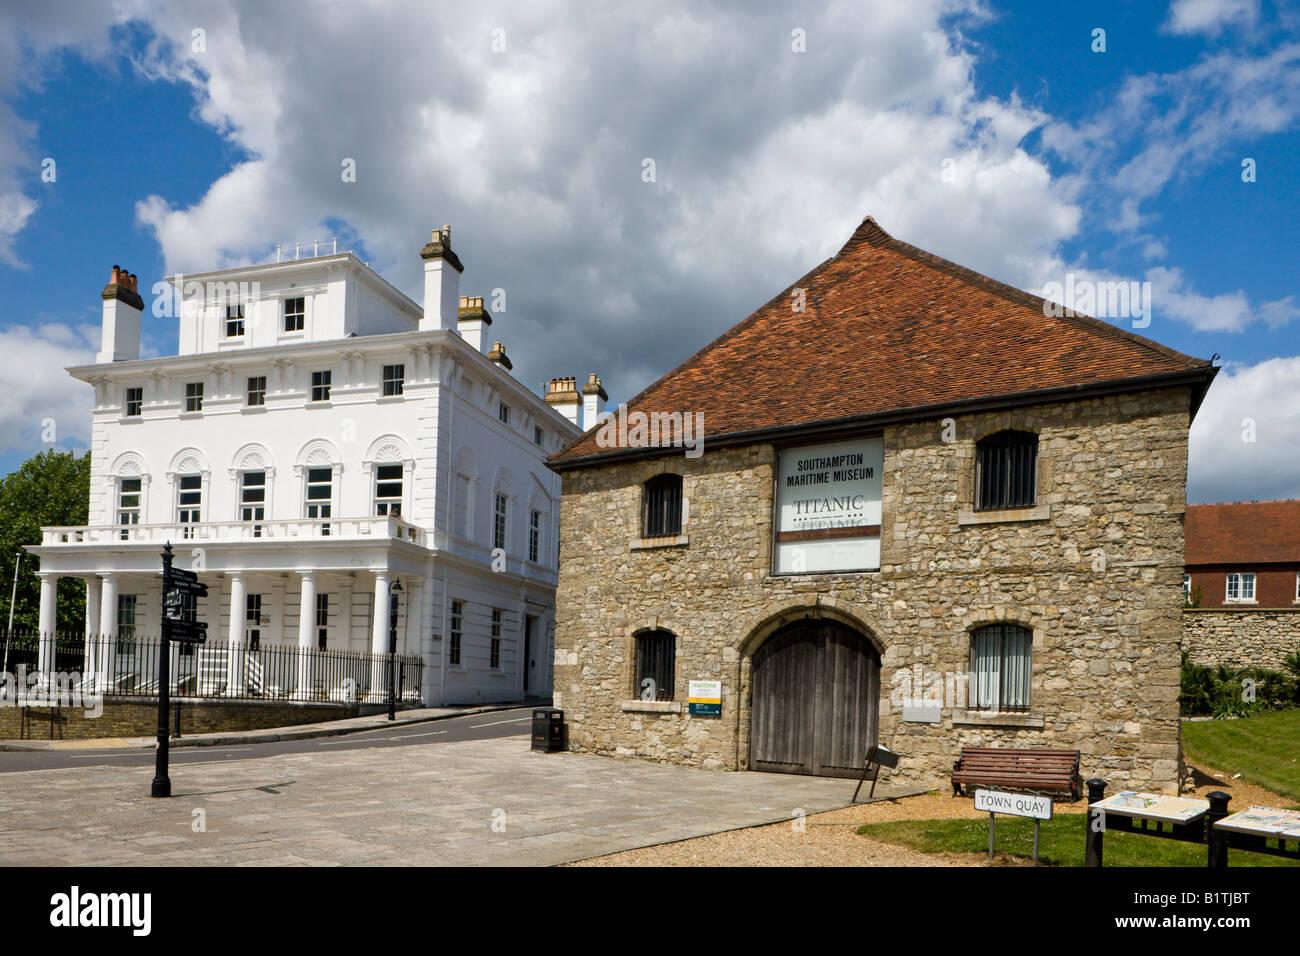 Southampton Maritime Museum, Wool House and Royal Yacht Club, Southampton, Hampshrie, England Stock Photo